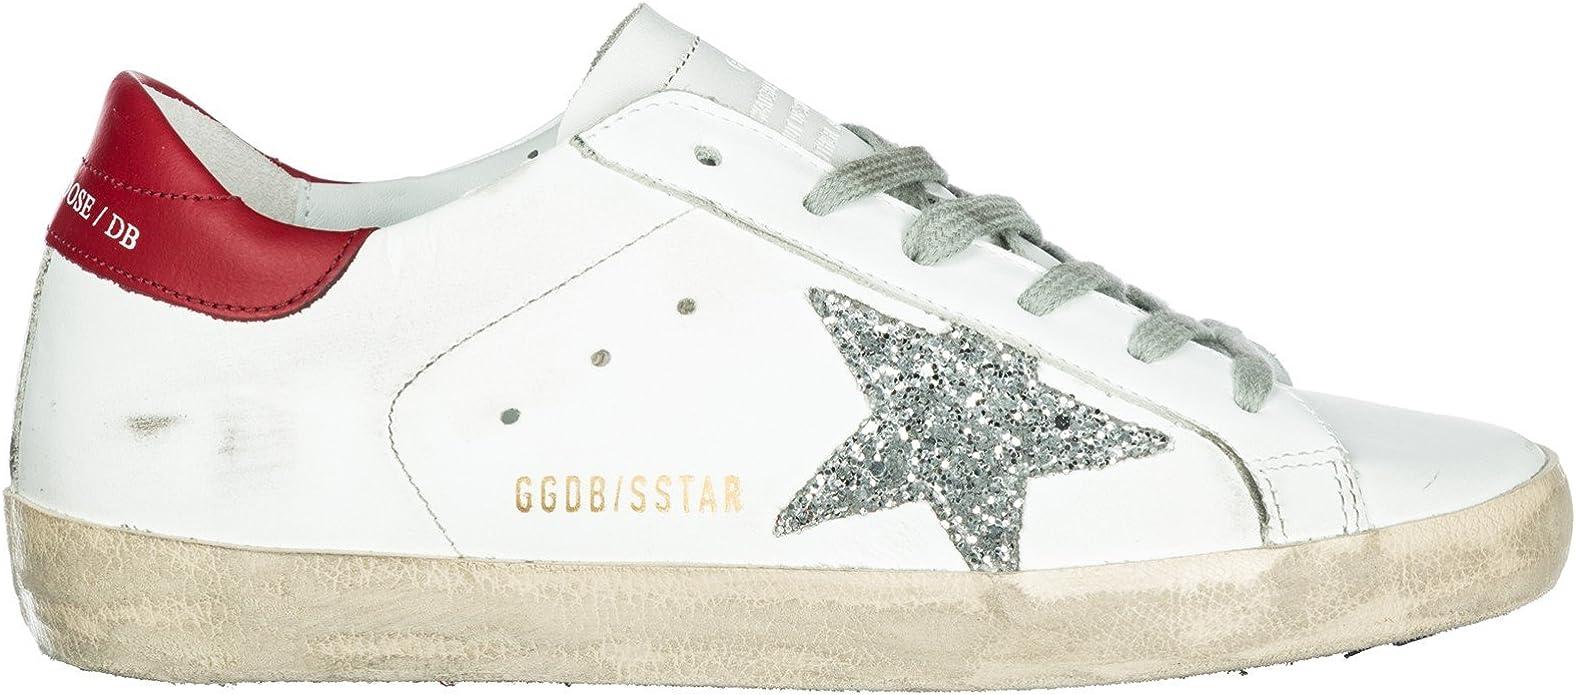 Golden Goose G33WS590 H16 SNEAKER